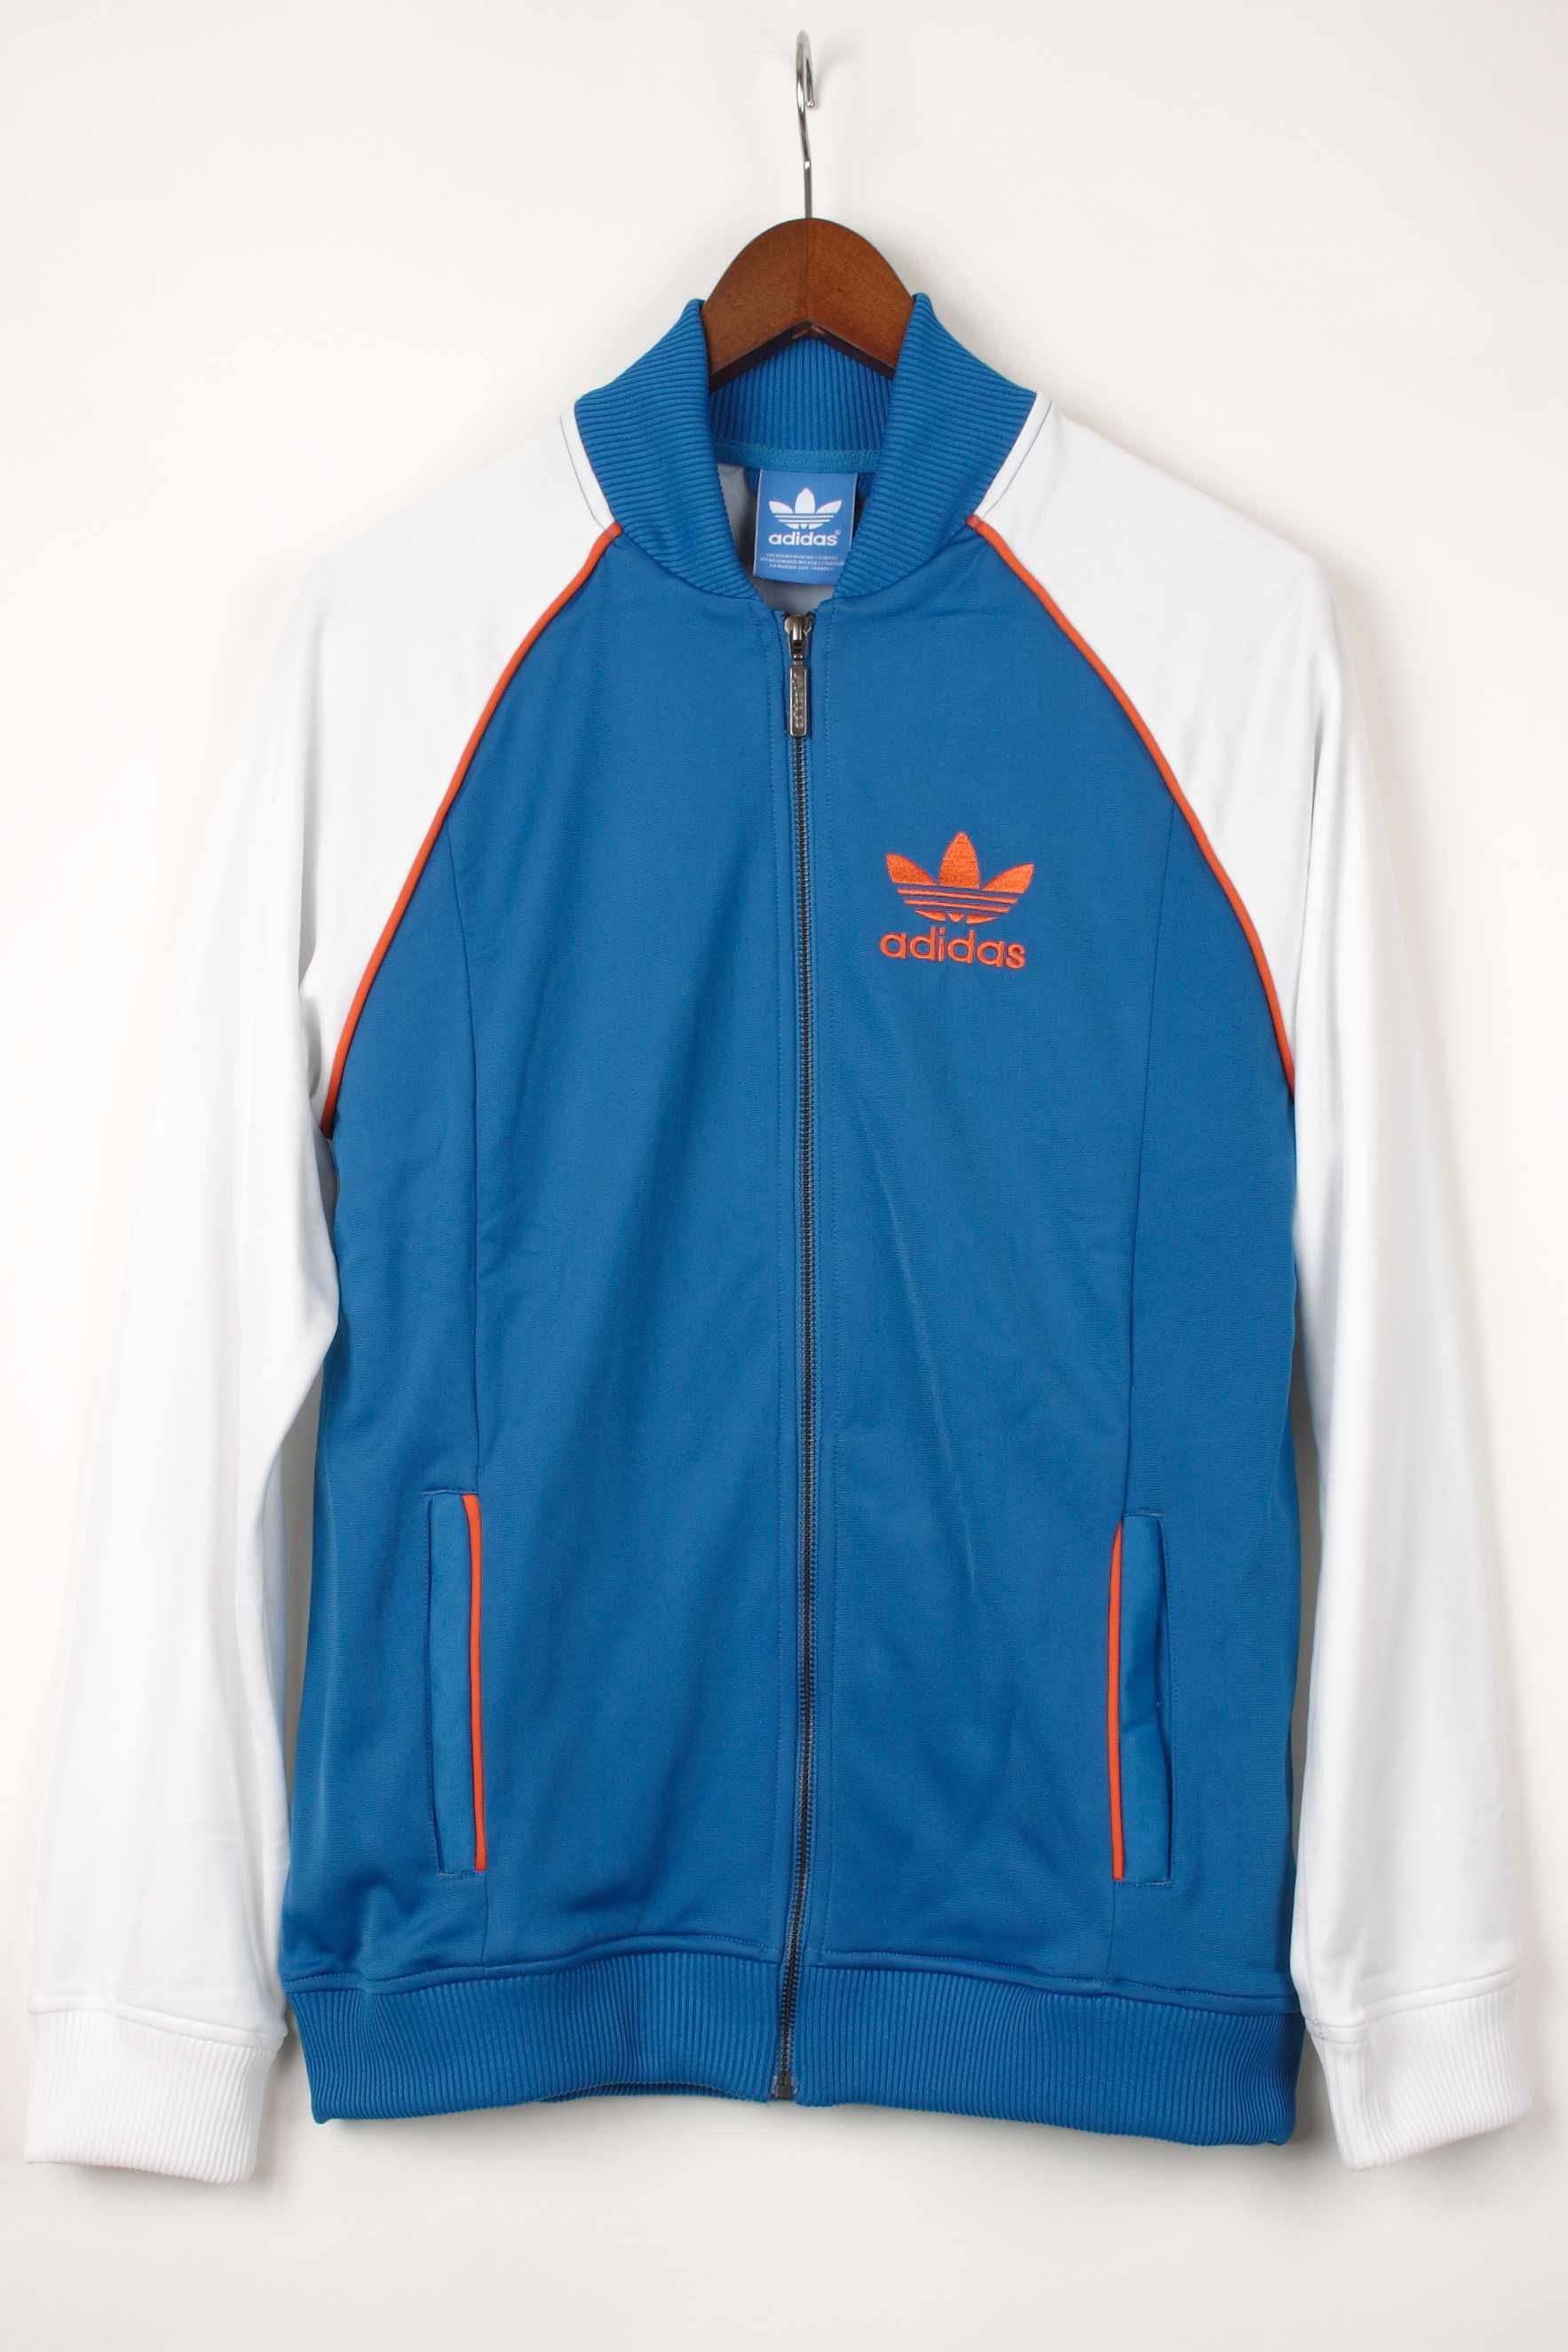 【adidas】アディダス スーパースタートラックトップ ジャージ ブルー SuperStarTrackTop Jersey blue